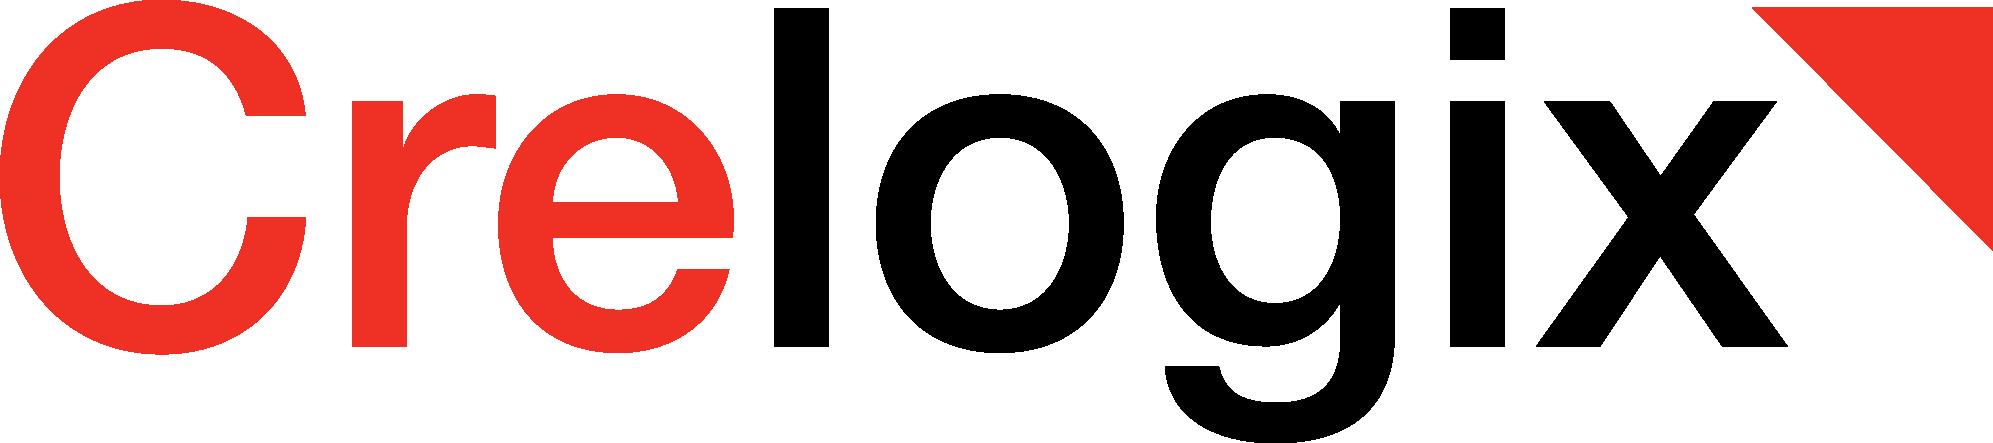 Crelogix Acceptance Corporation company